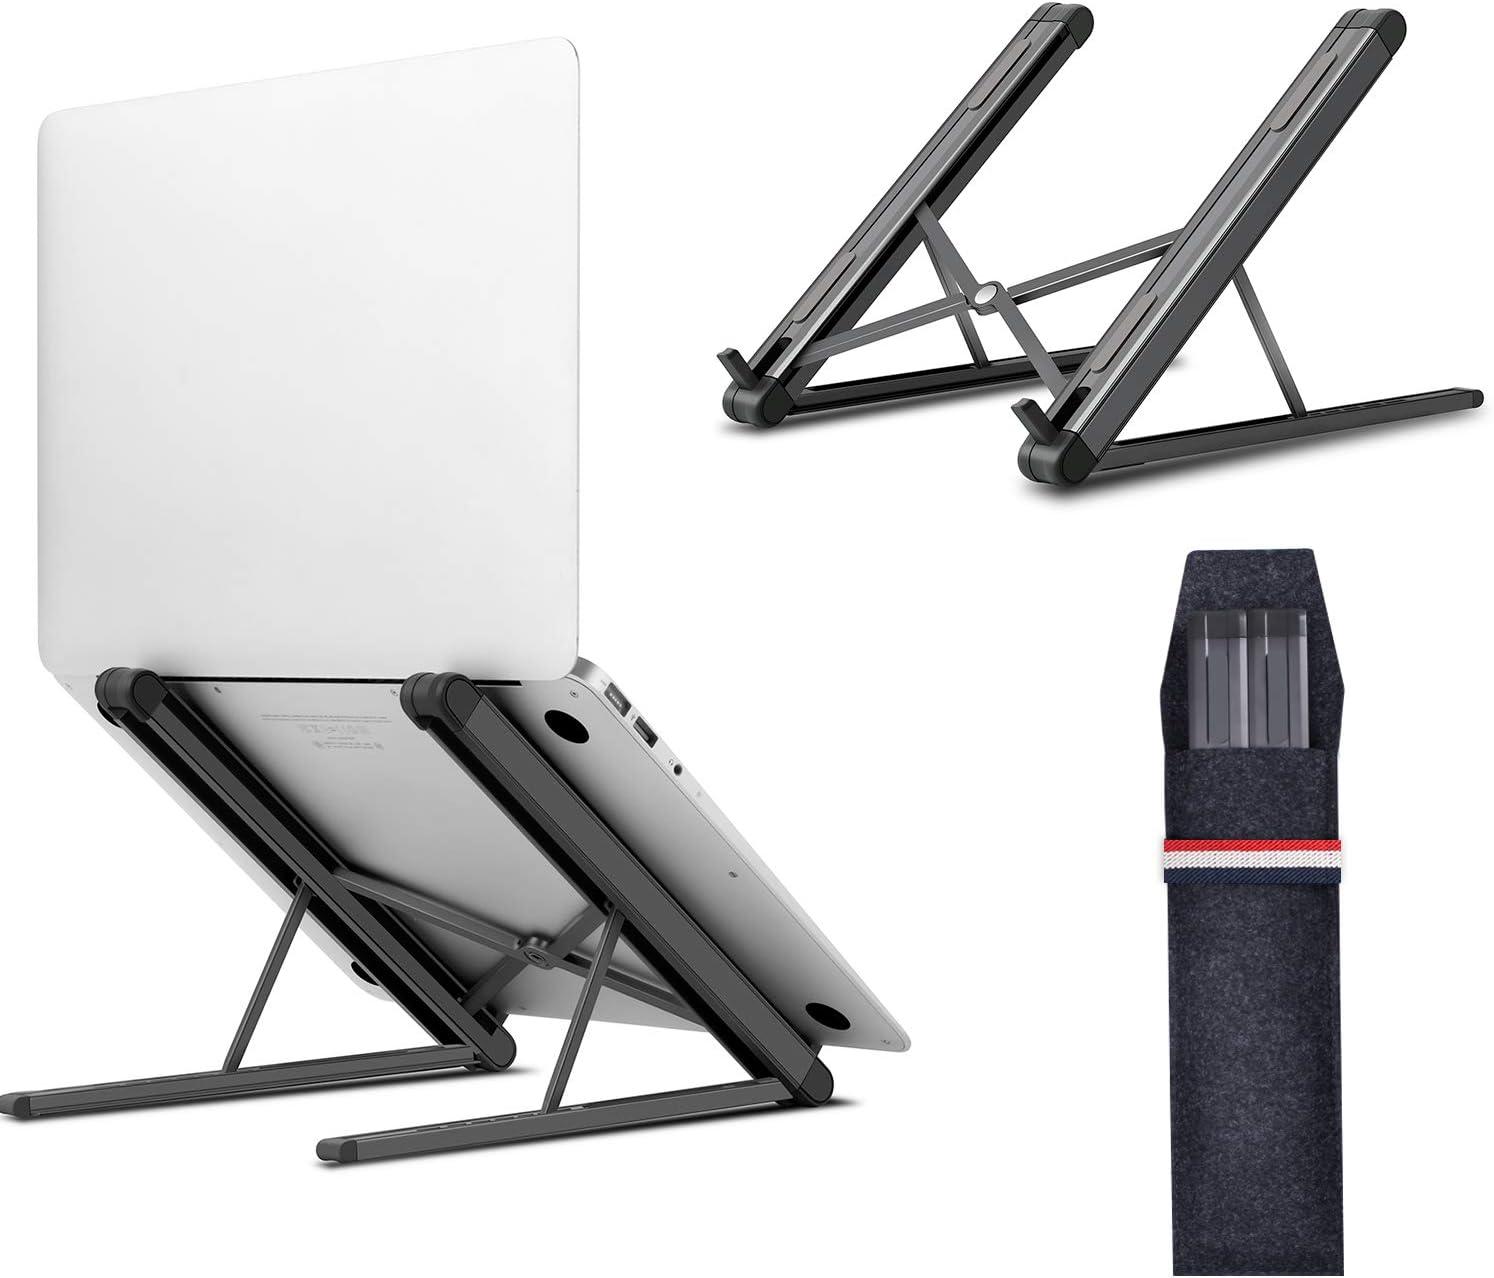 Jubor Laptop Stand Portable Mount Dealing full price reduction Luxury goods Lap Computer Aluminum